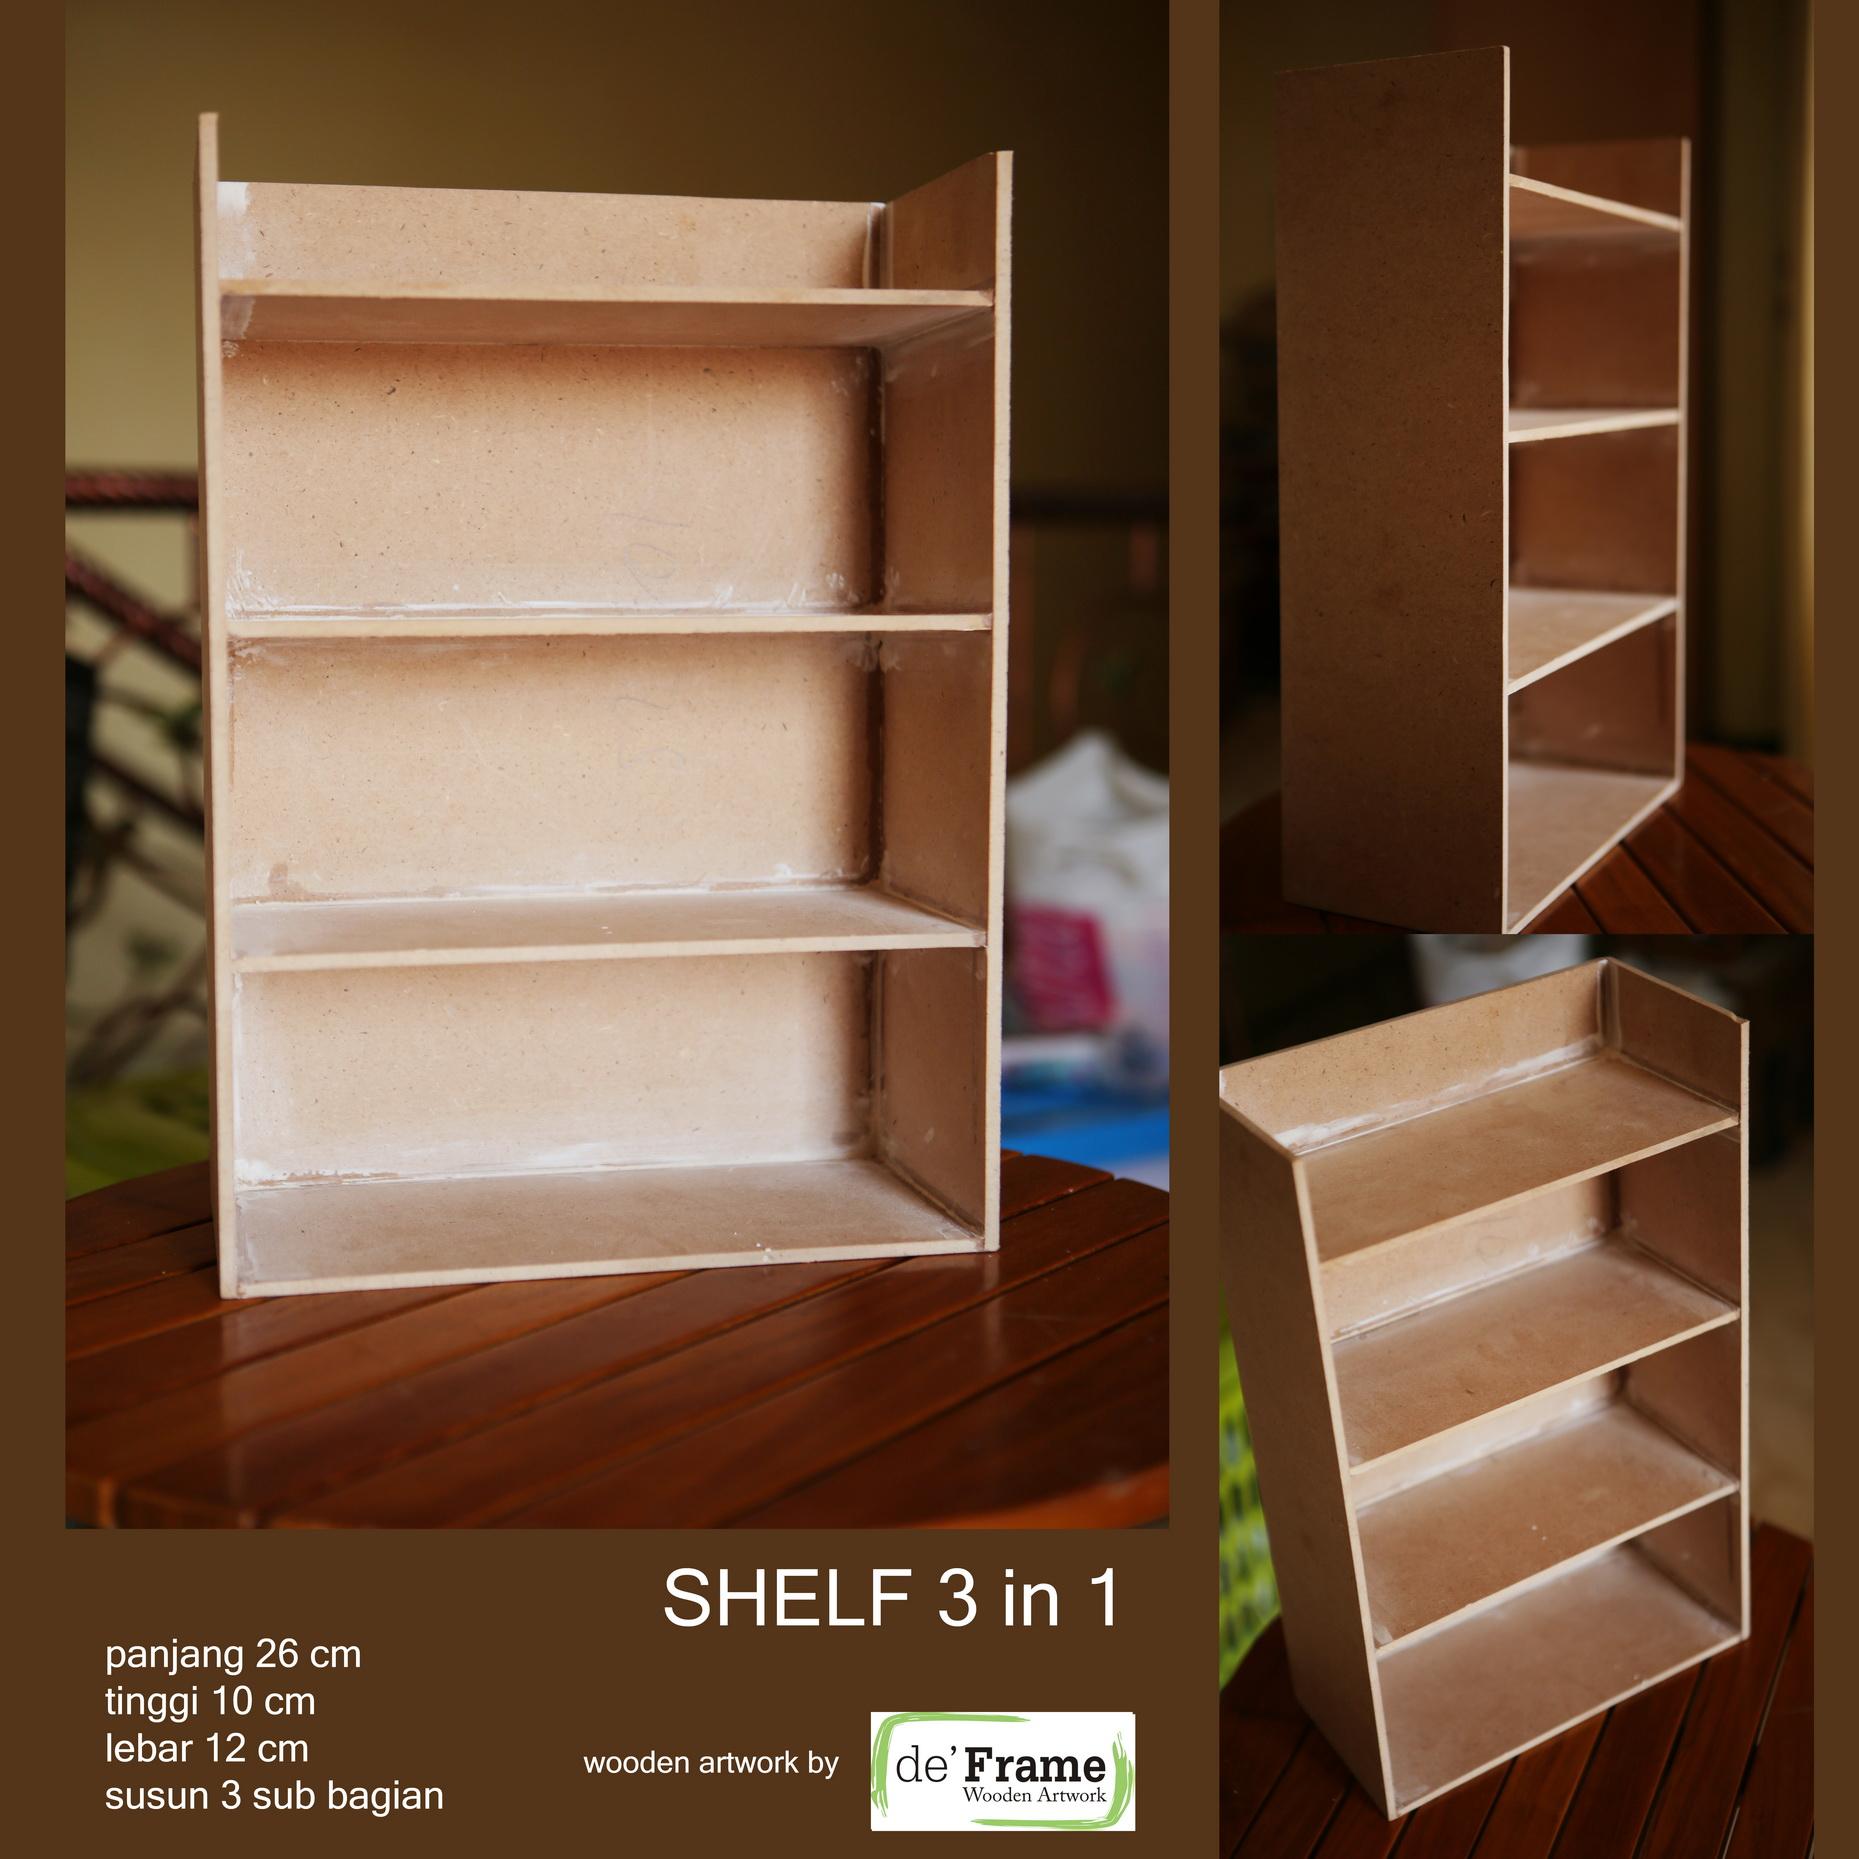 SHELF 3 In 1 Bahan Pigura Foto Scrapbook Home Decor